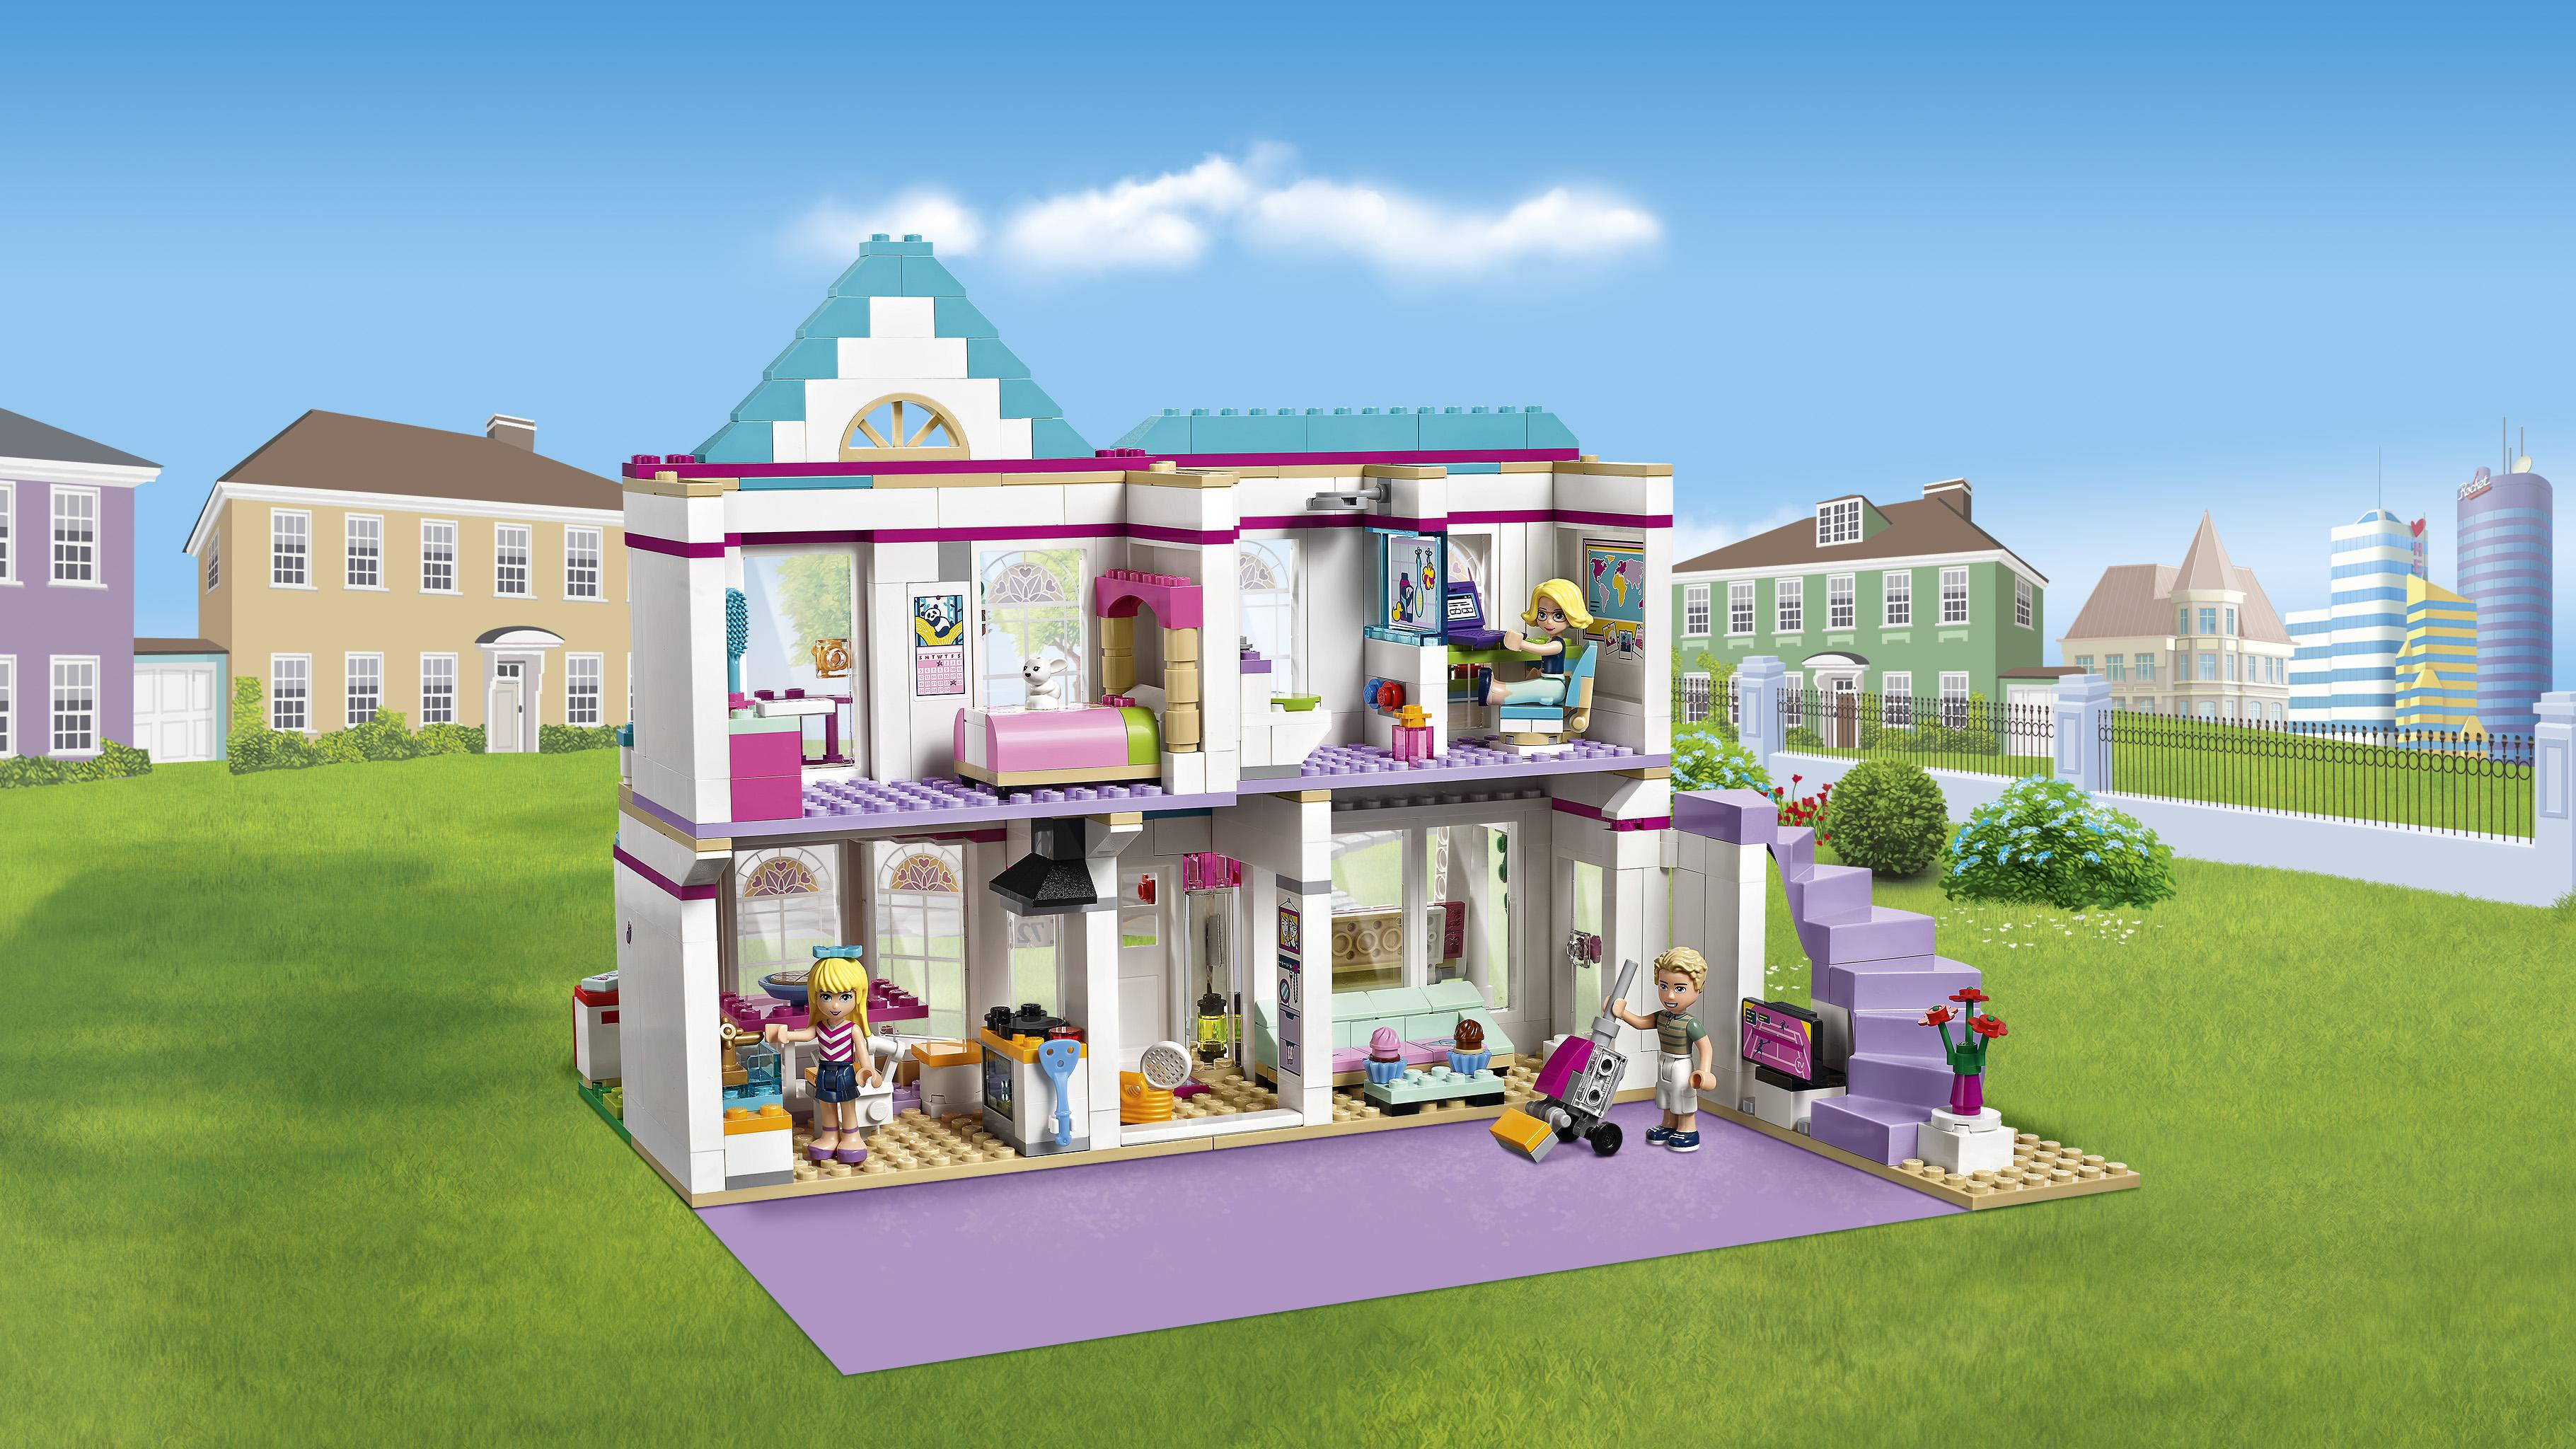 Lego friends 41314 set costruzioni la casa di stephanie for Costruisci tu stesso piani di casa